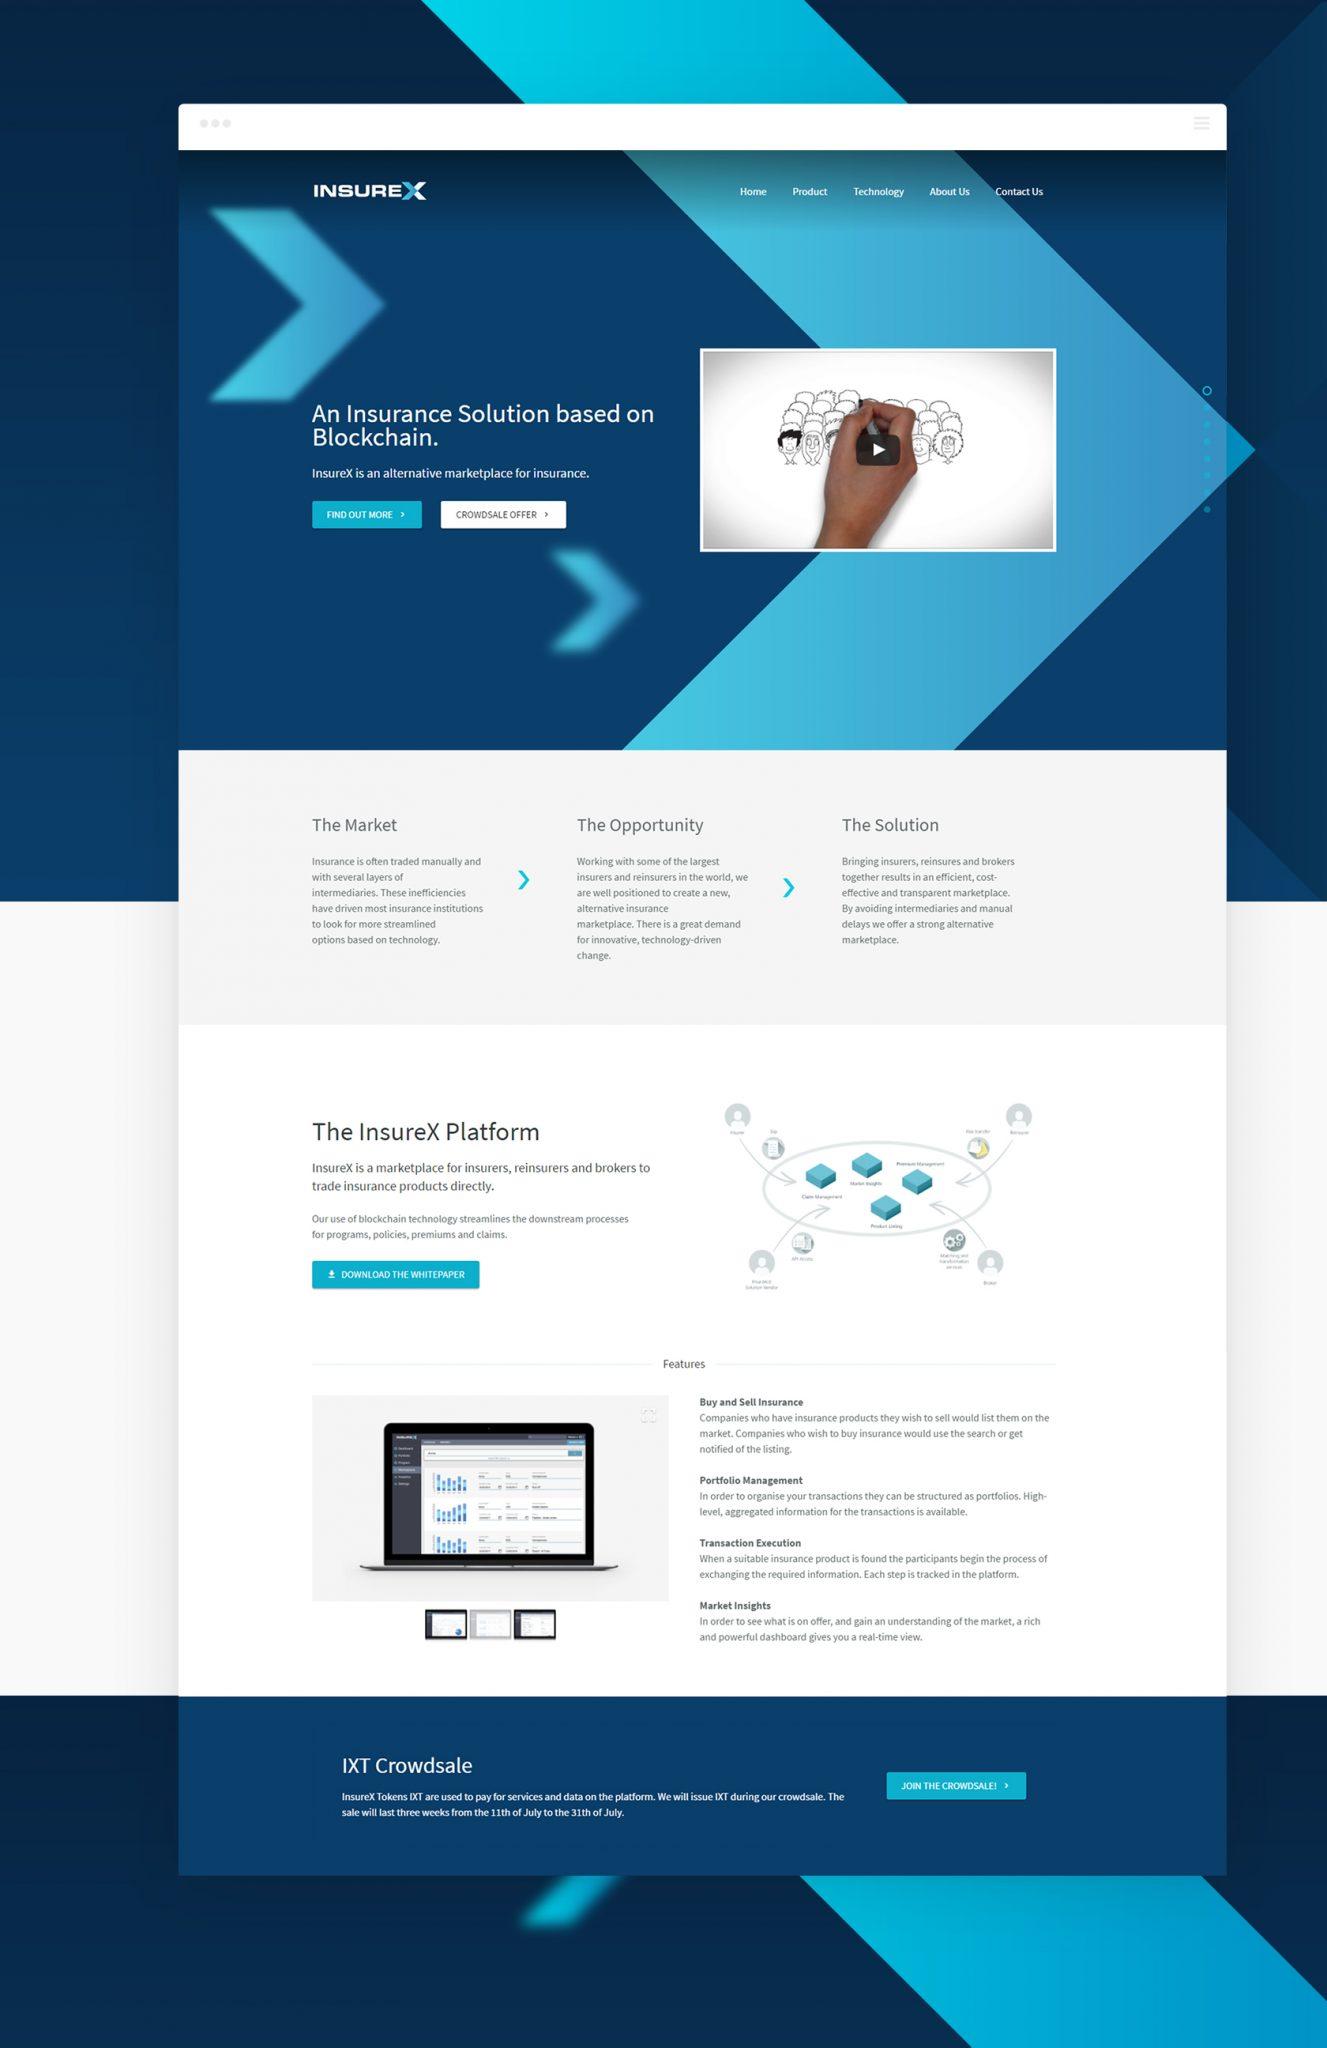 InsureX Home 1 - InsureX (Branding) - Creative Digital